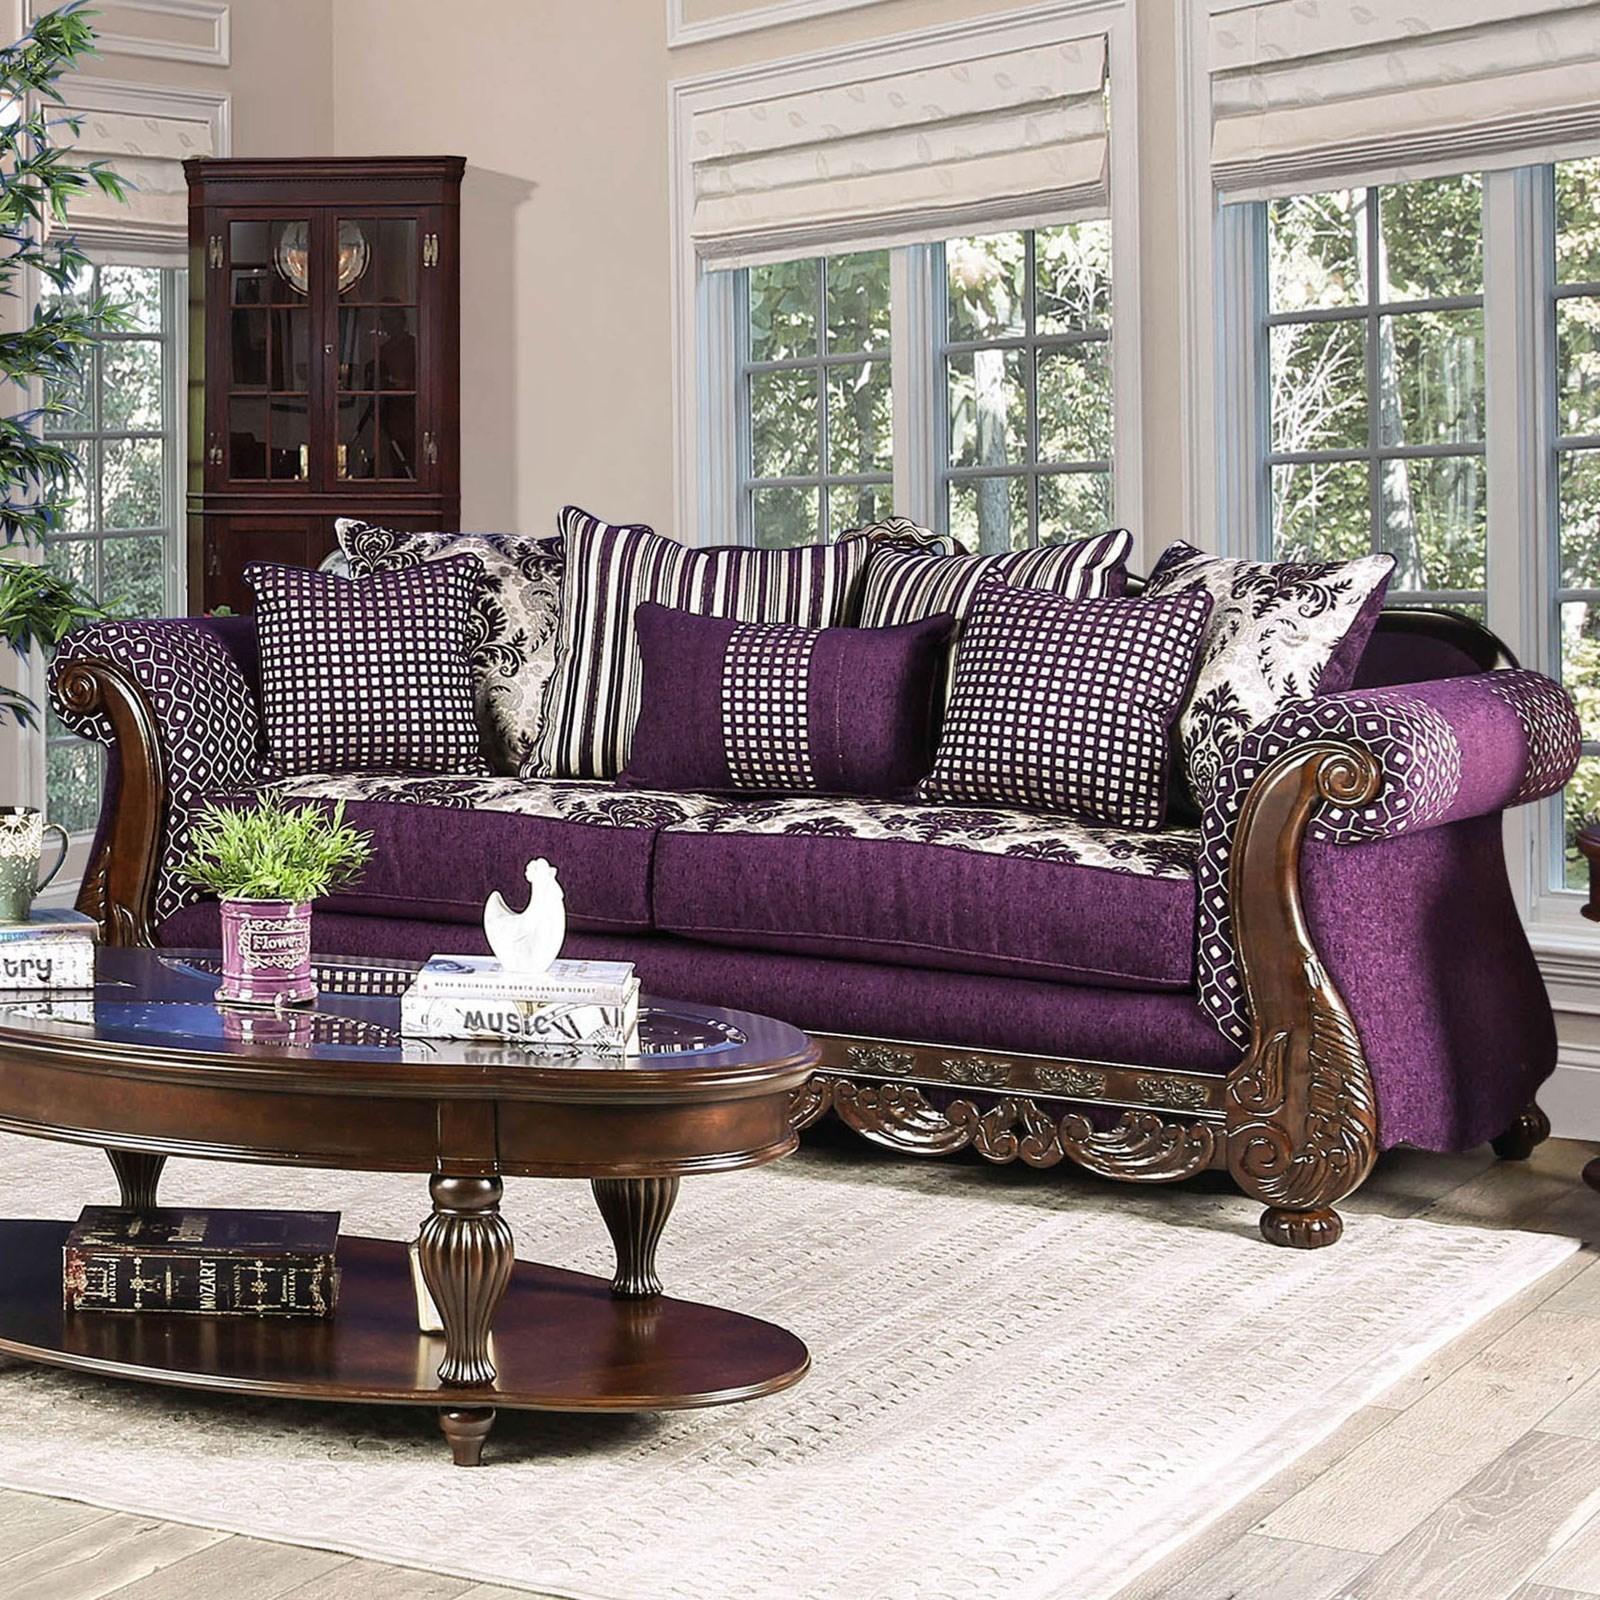 Furniture Of America Emilia Traditional Sofa With Ornate Wood Trim